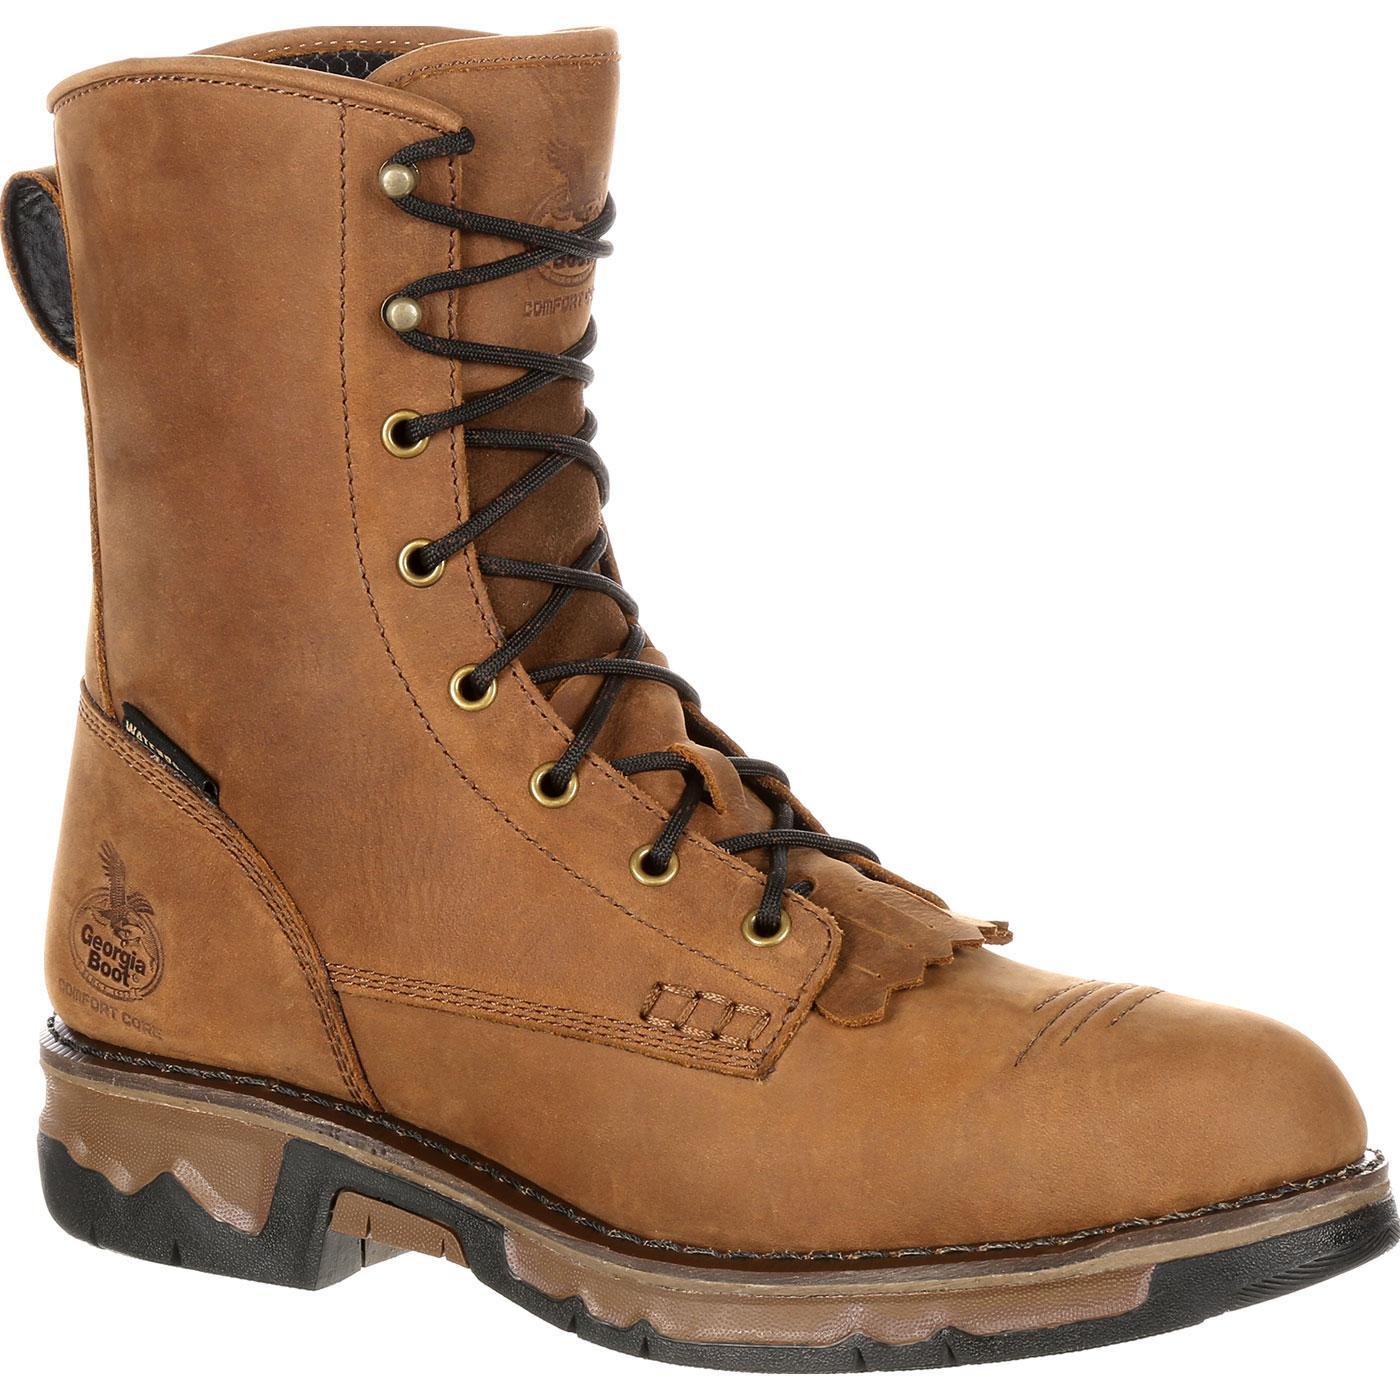 Georgia Boot Carbo-Tec CT (Men's) j9nrmLQjW